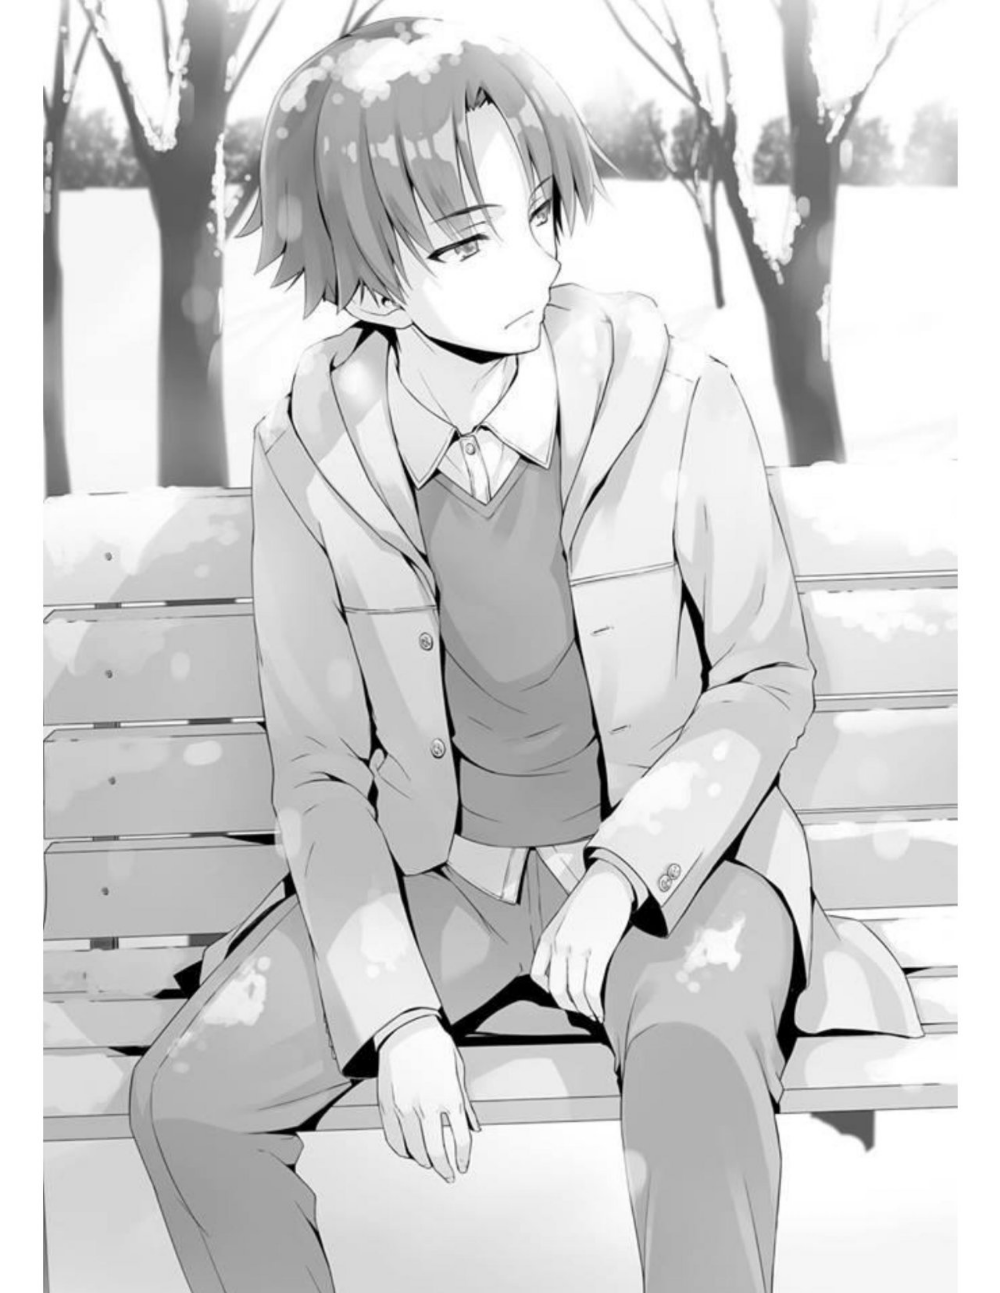 Youkoso Jitsuryoku Shijou Shugi No Kyoushitsu E Capítulo 56 00 Volumen 7 5 Capítulo 3 Gladheim Translation Ilustração De Mangás Anime Animes Wallpapers